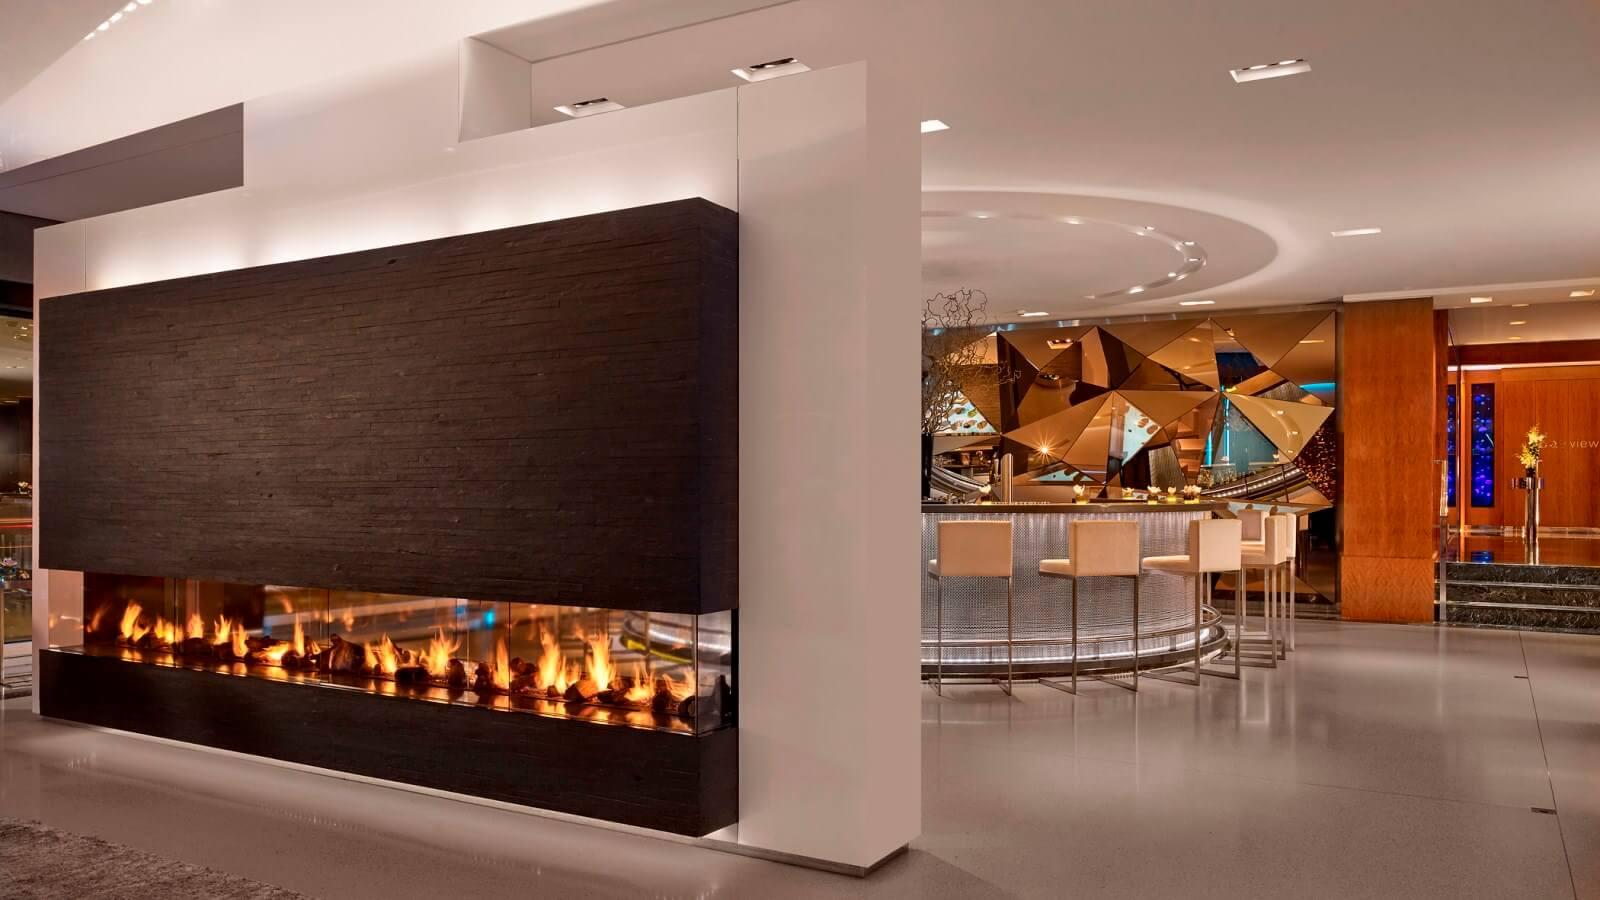 Hotel-President-Wilson-lux1274re-177386-Glow-Bar-Impressive-Fireplace.jpg